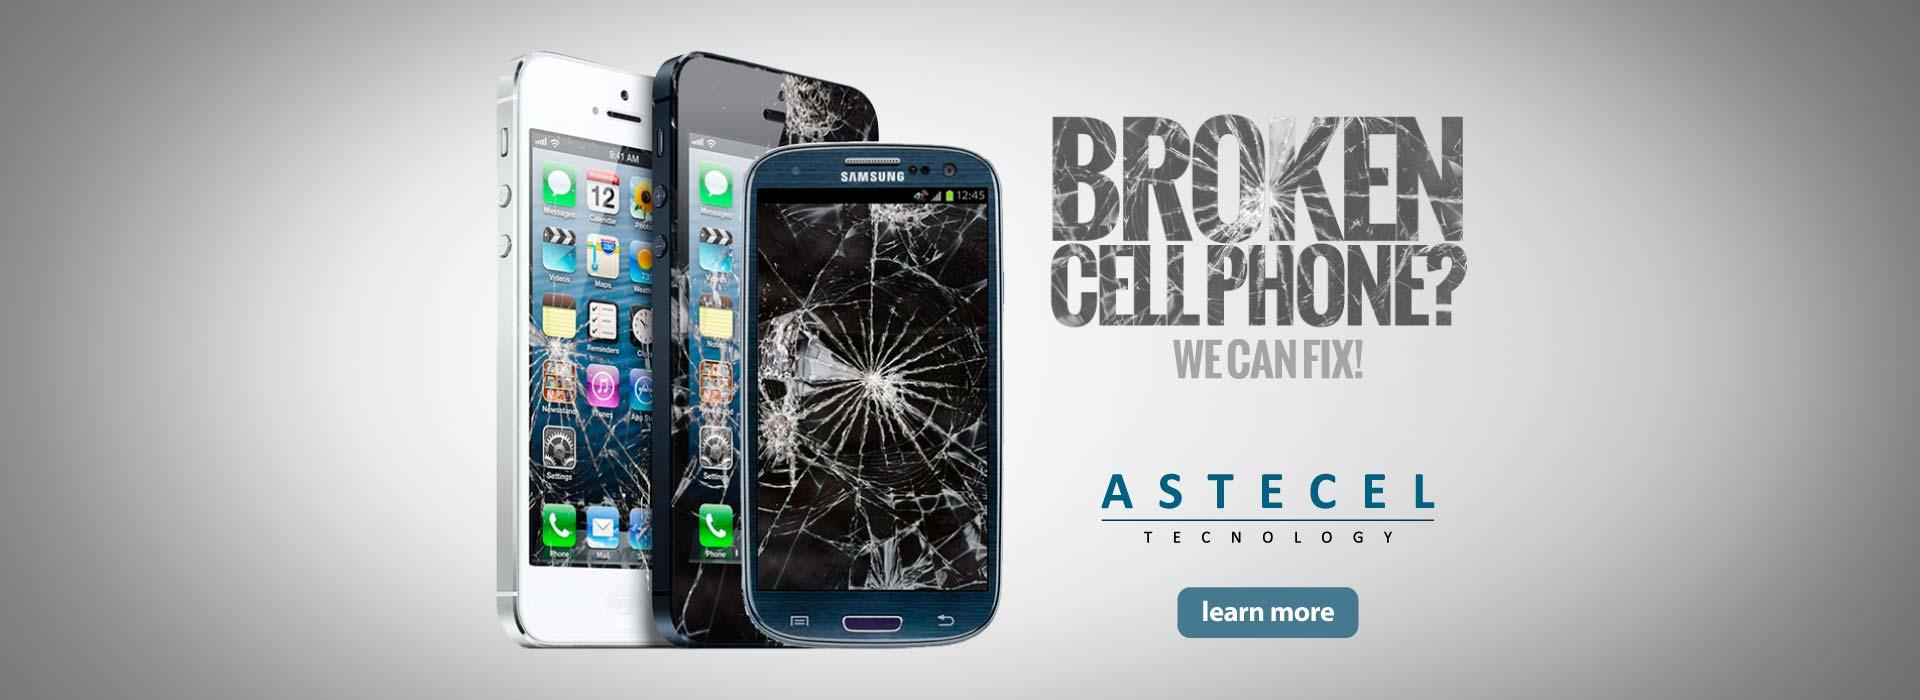 astecel-tecnologia-jrc-en